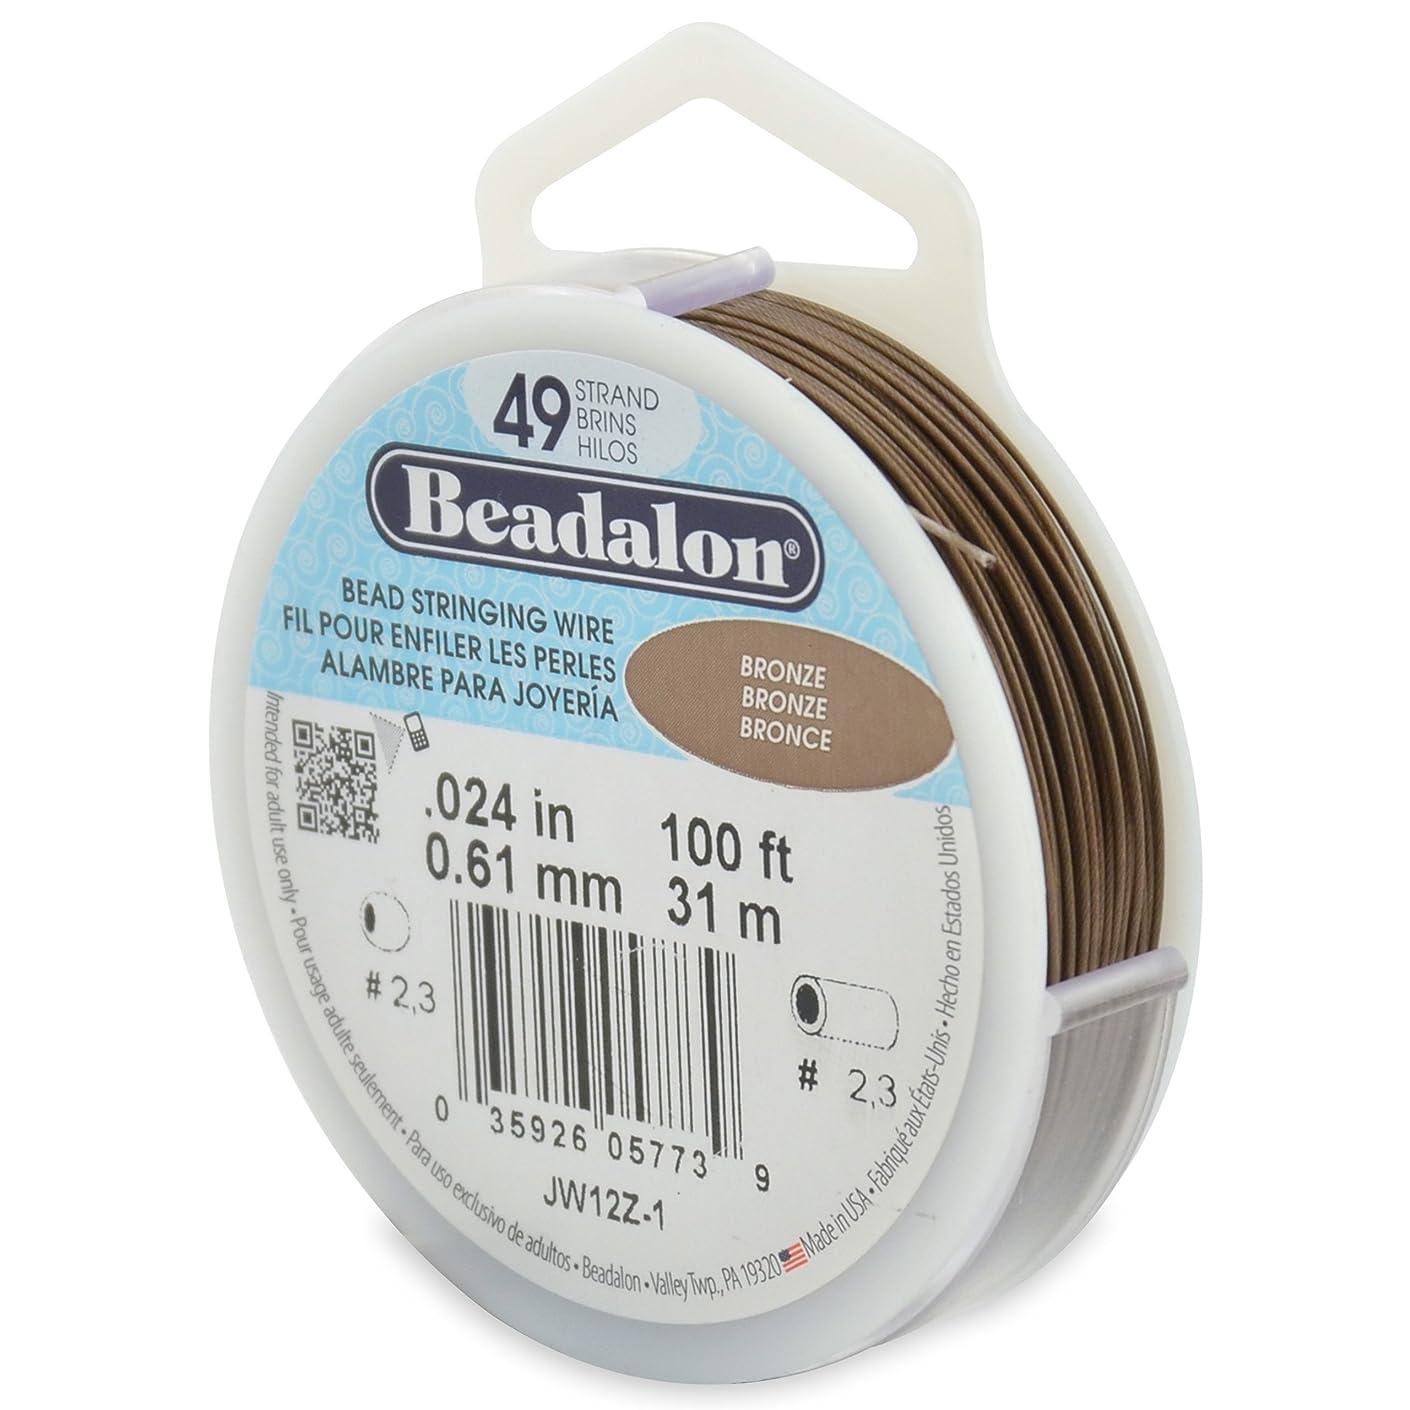 Beadalon 49-Strand 0.024